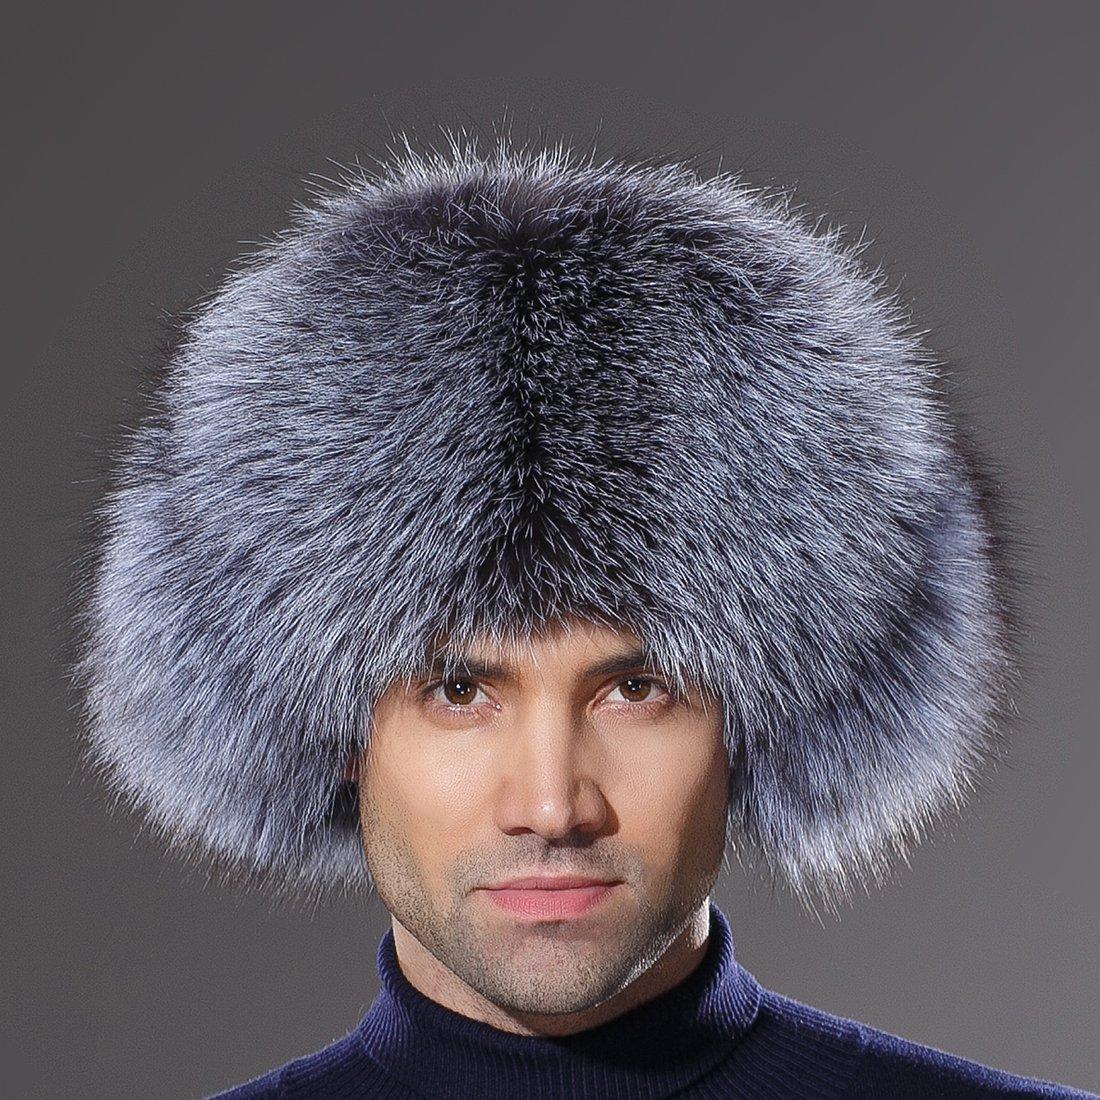 URSFUR Winter Mens Trapper Hat Real Leather Silver Fox Fur Russian Ushanka Cap by URSFUR (Image #2)